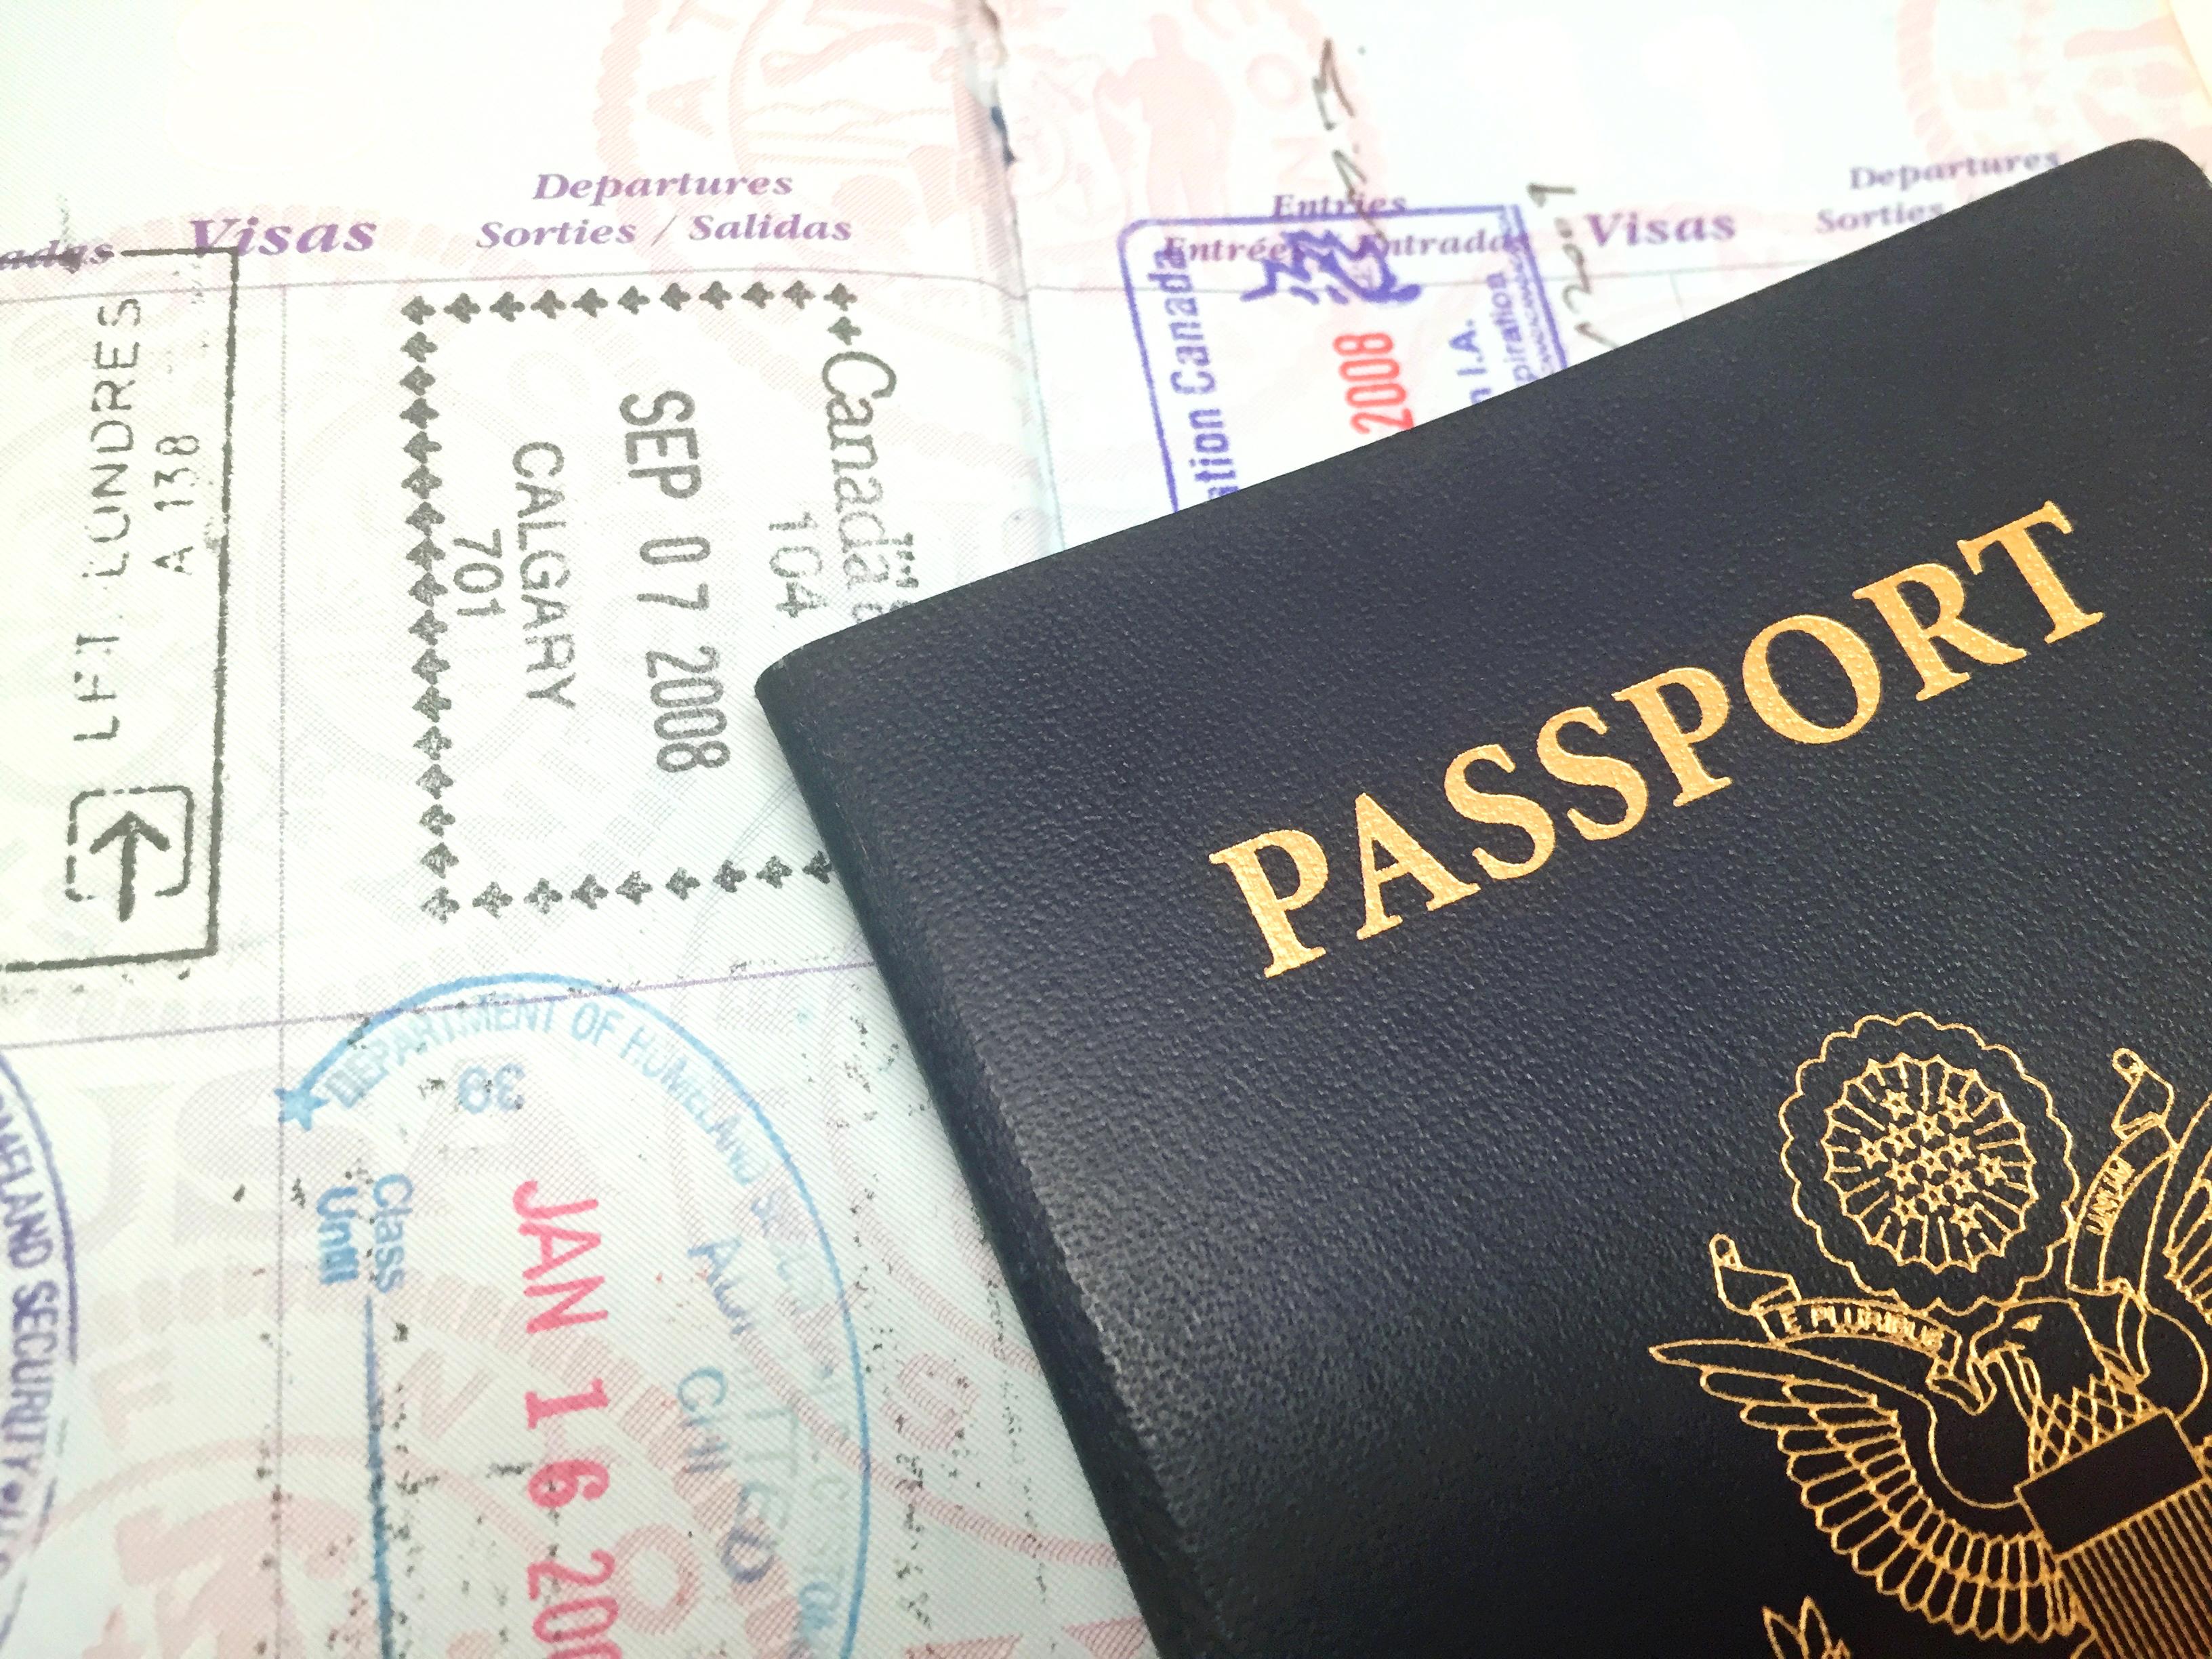 Next-Generation US Passport Debut | American Express GBT